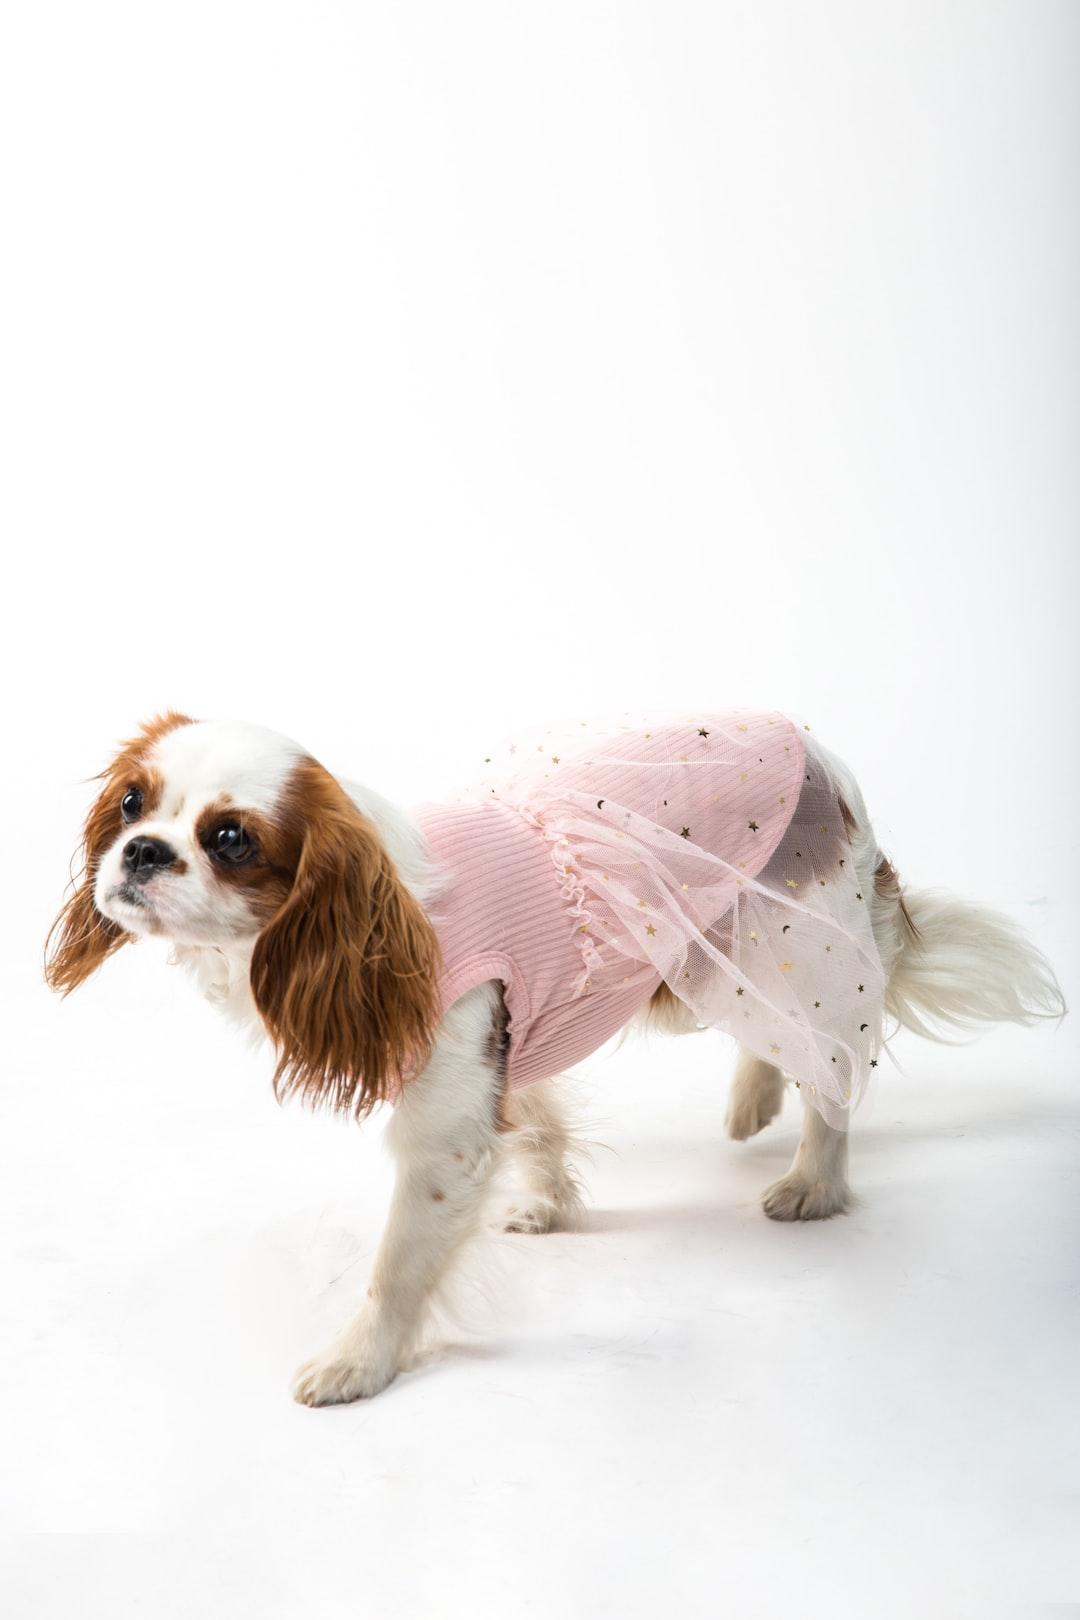 cute King Charles Cavalier dog wearing a pink princess dress